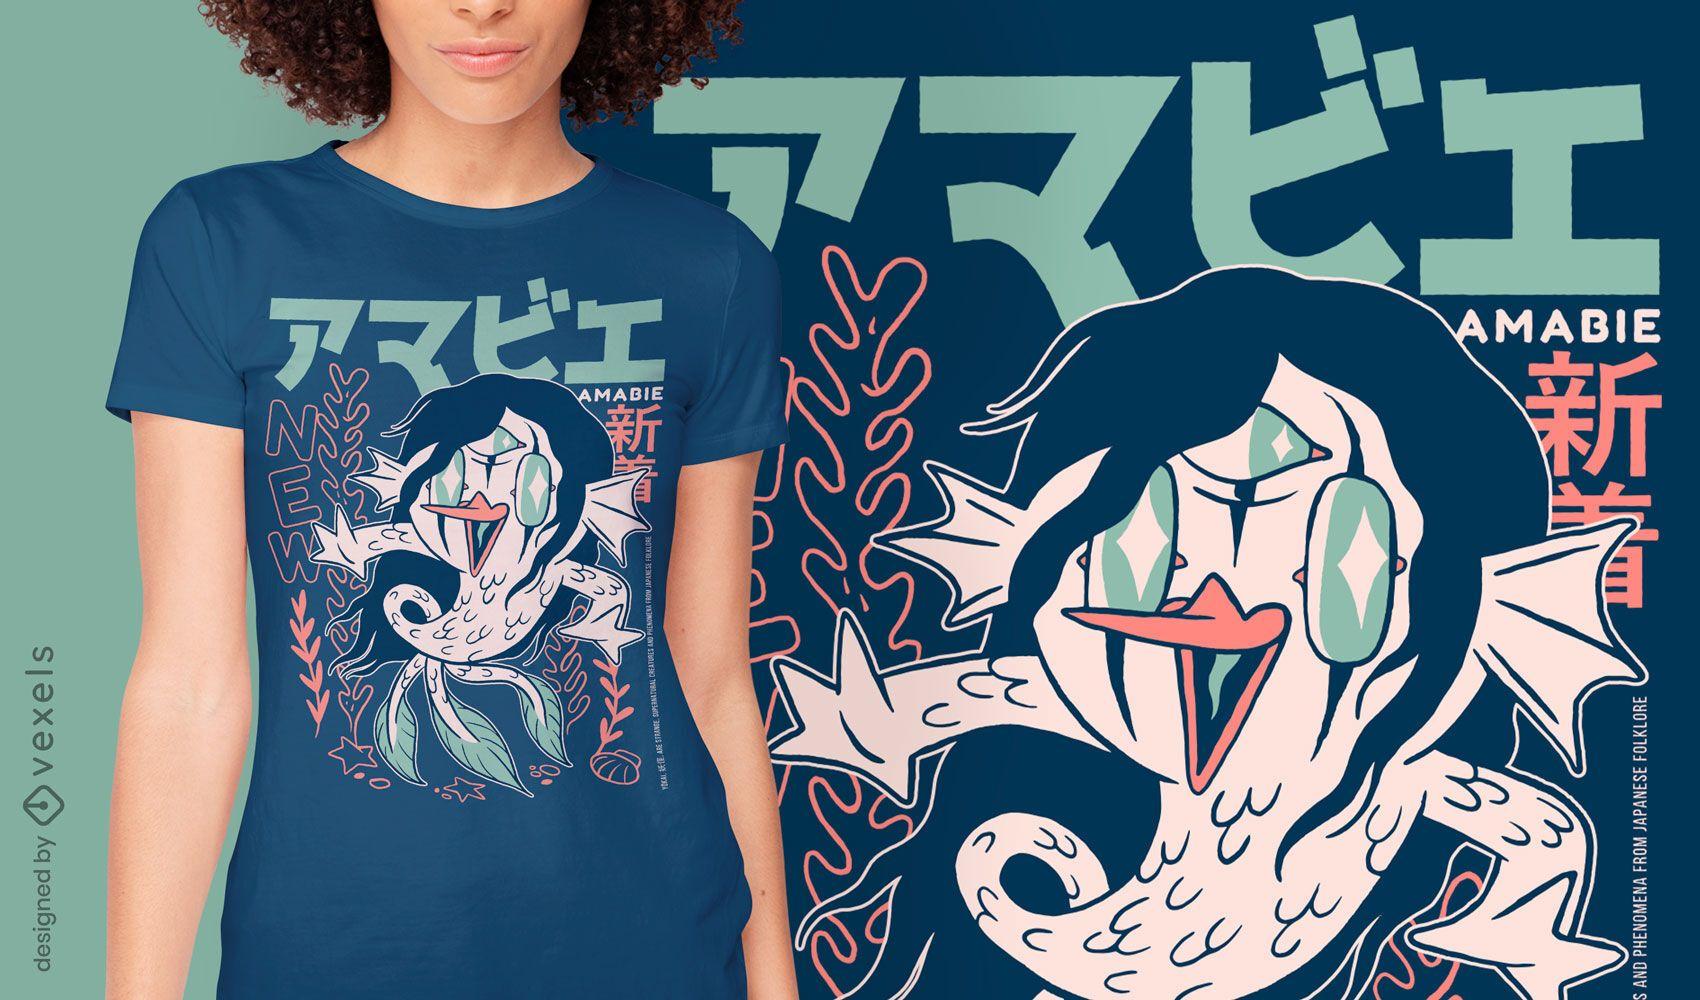 Amabie japanisches Yokai T-Shirt Design